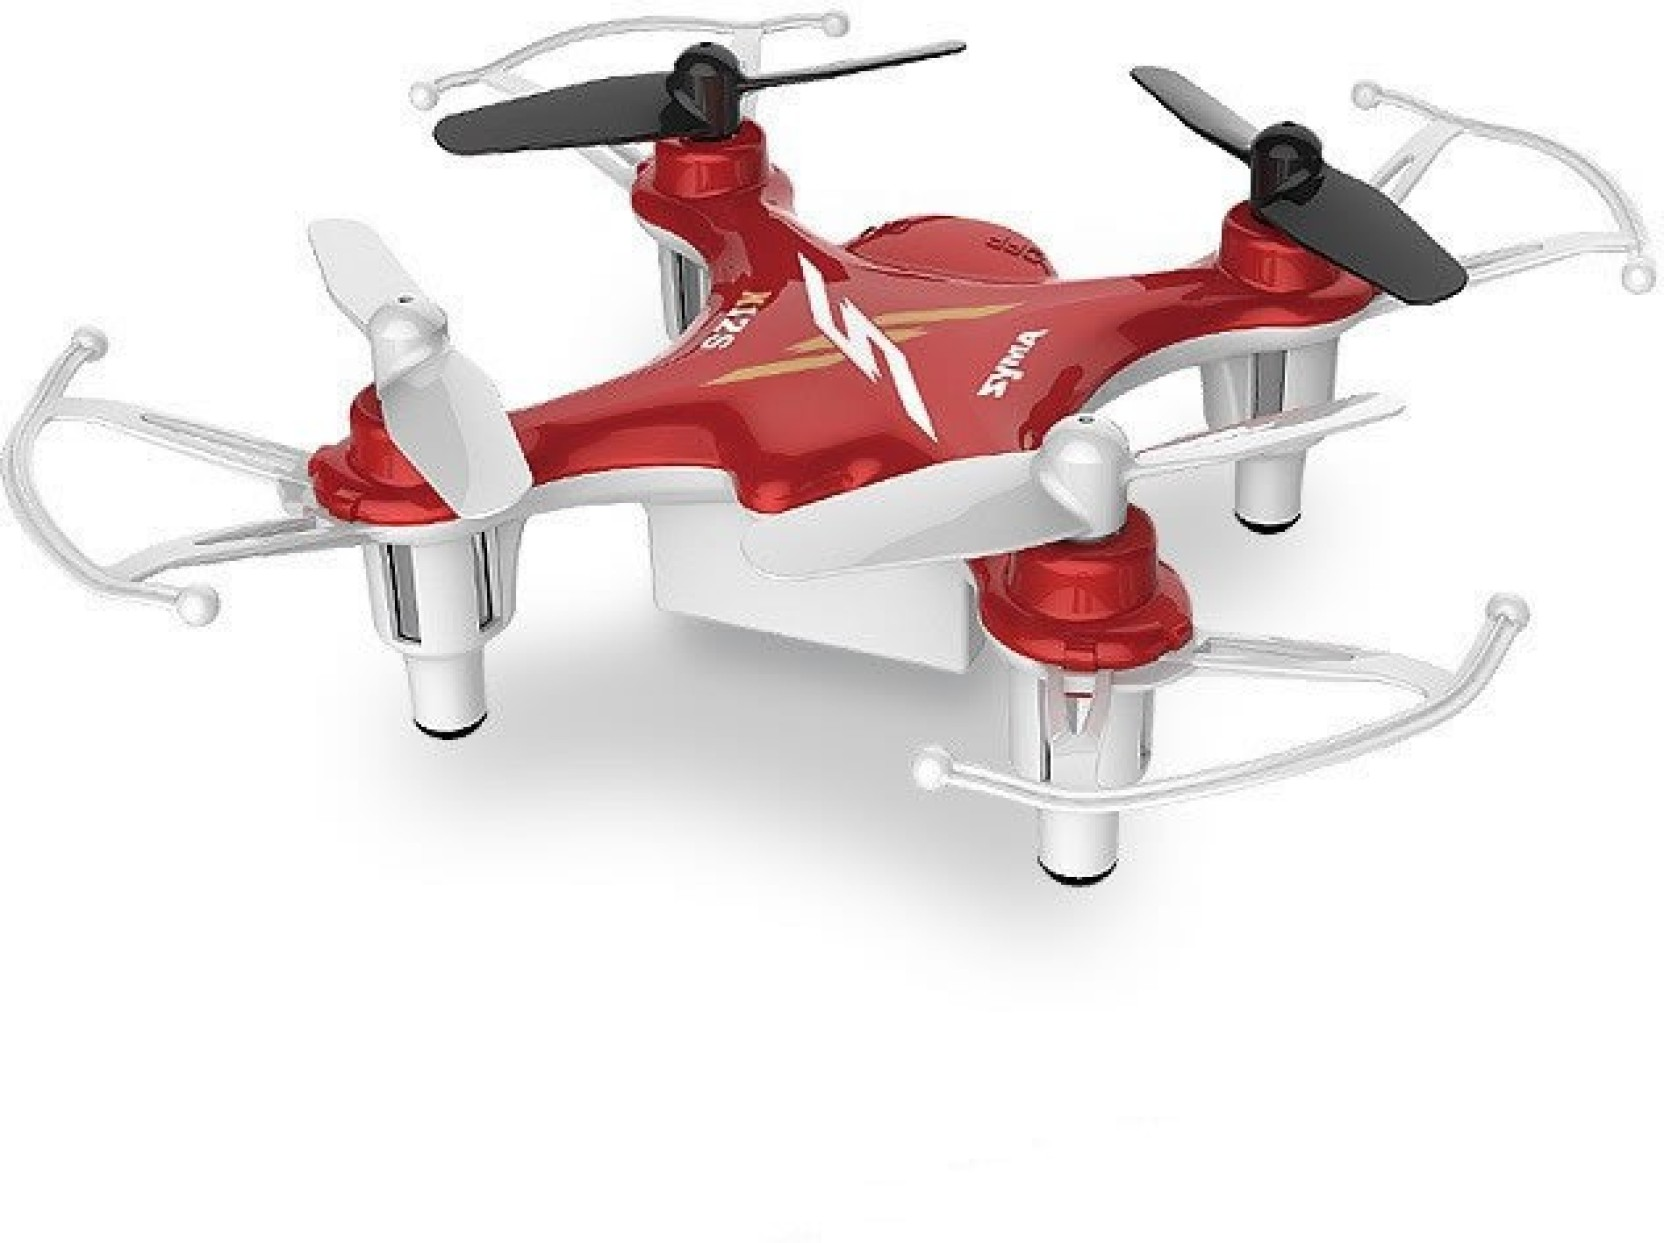 ead069aecb2 SYMA X12S with 2.4G 4CH 6-Axis Headless Mode Nano RC Quadcopter ...